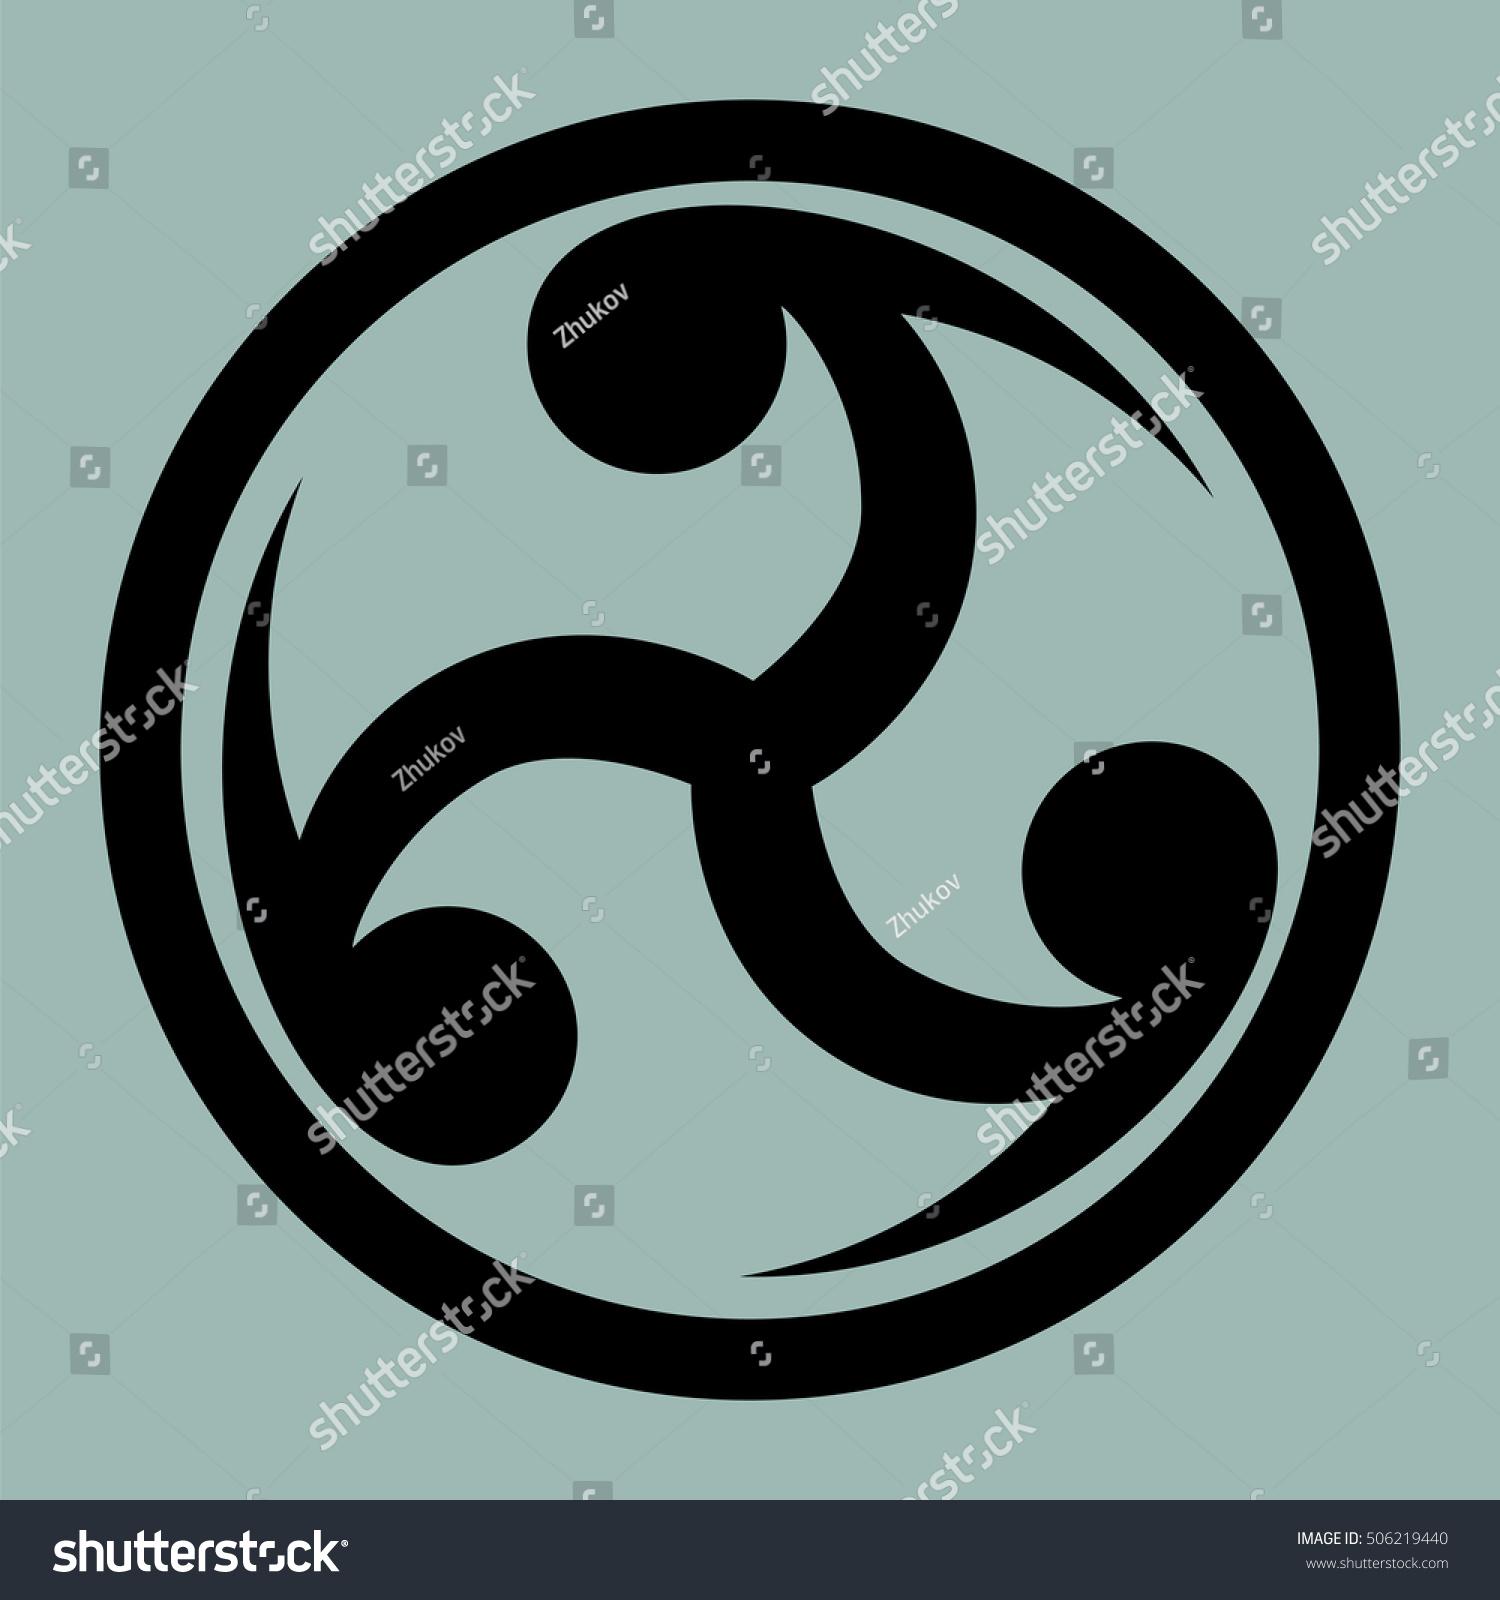 Mitsu Tomoe Japanese Symbol Visual Representation Stock Illustration